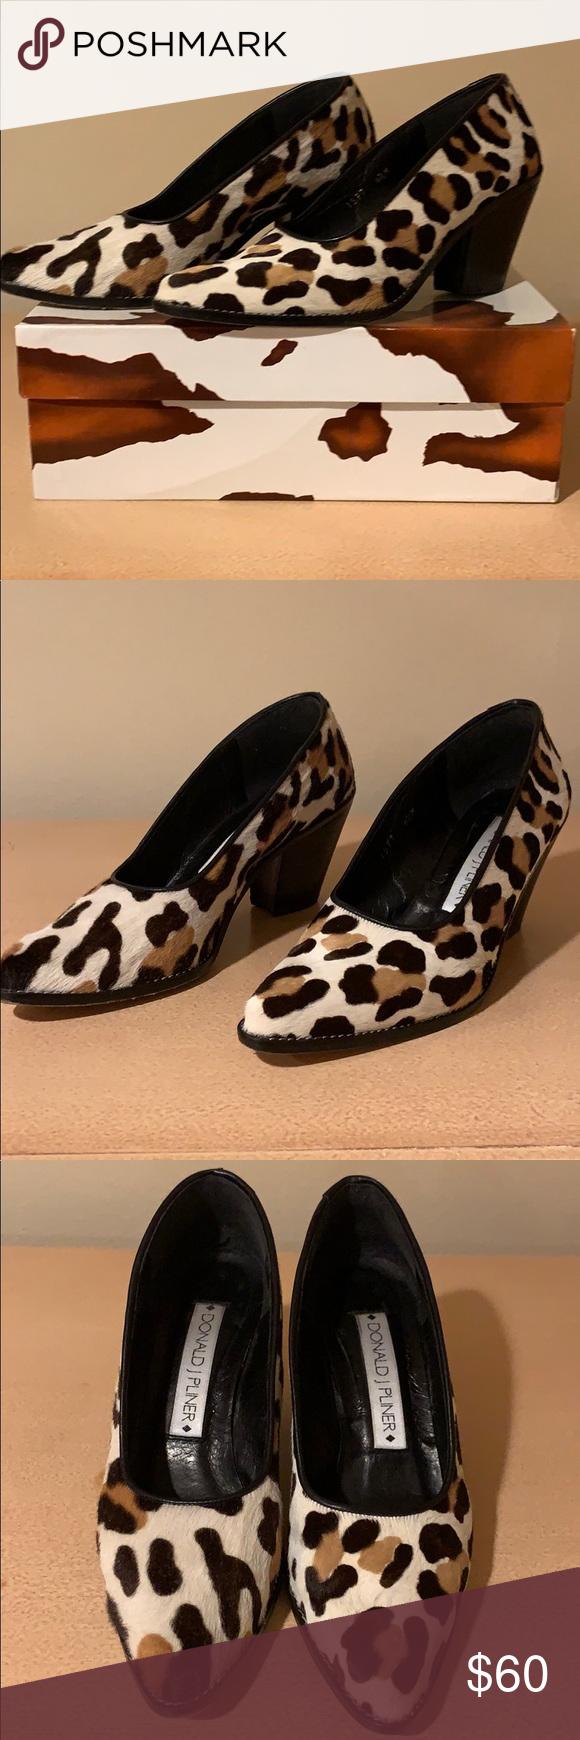 Donald J Pliner Leopard Print Shoes in